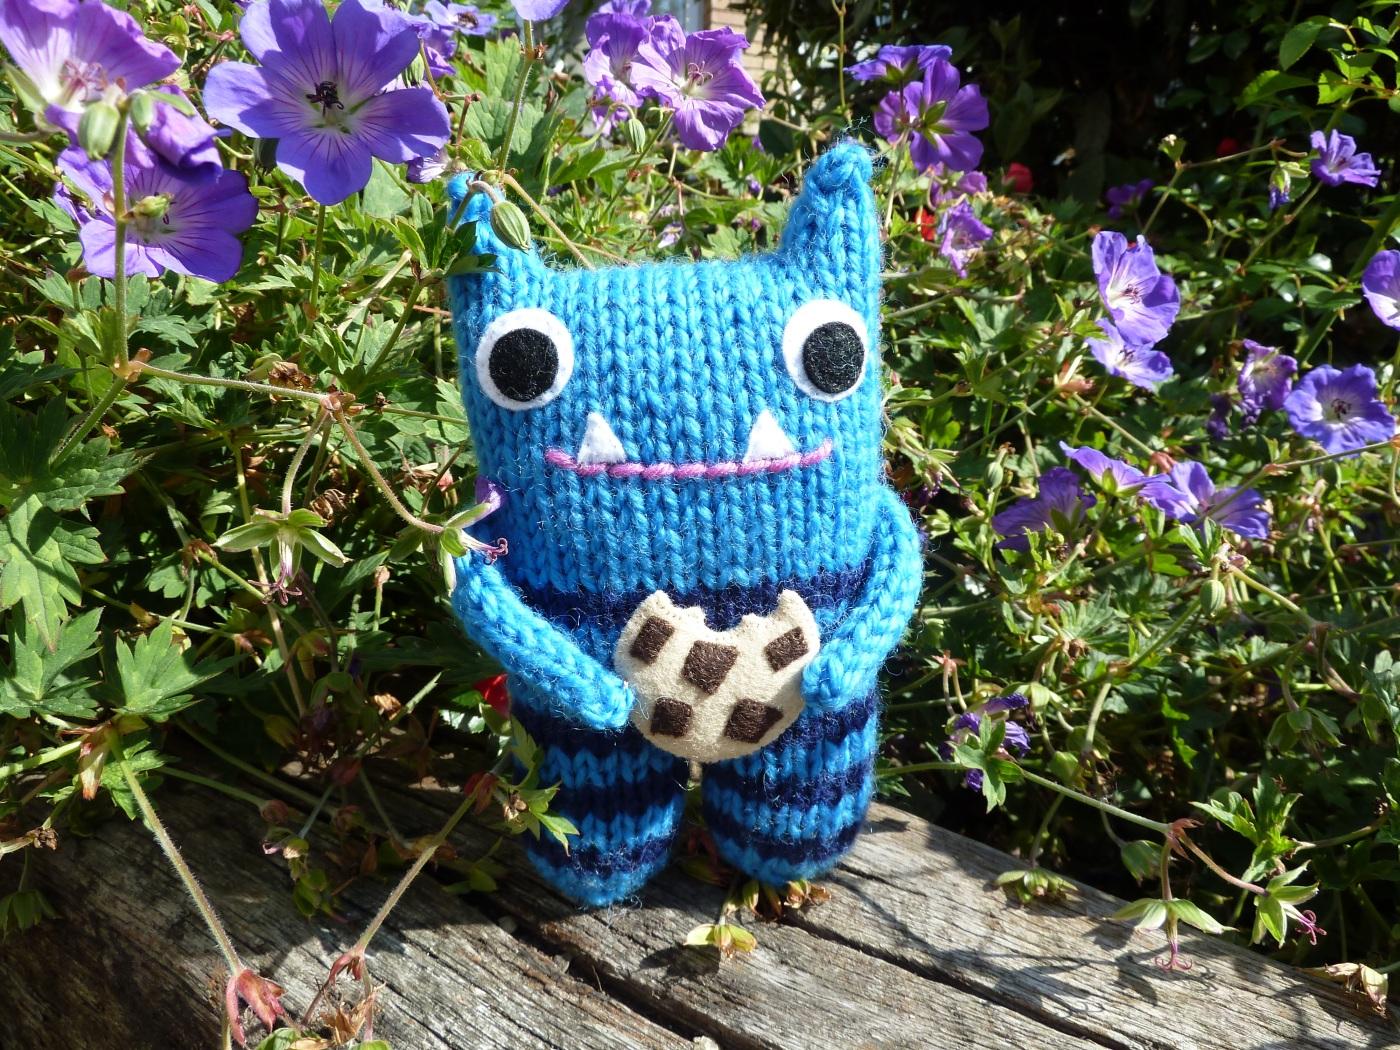 Meet Cookie Beastie - CrawCrafts Beasties